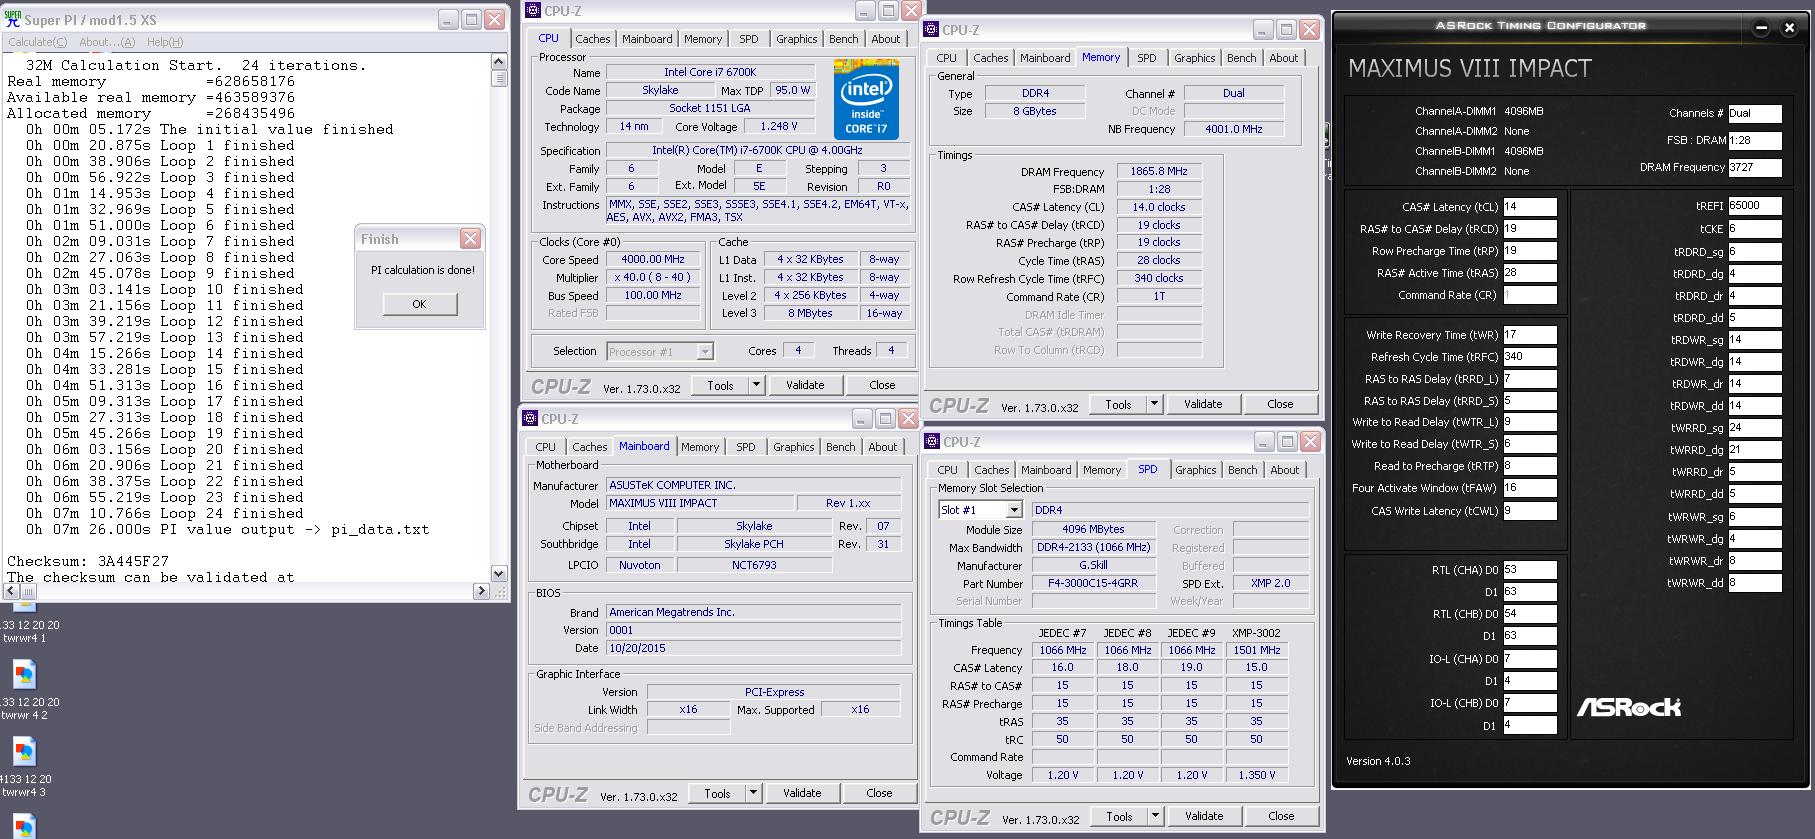 GUIDE] Skylake Memory Timings on Asus Motherboards ! - Memory Heaven